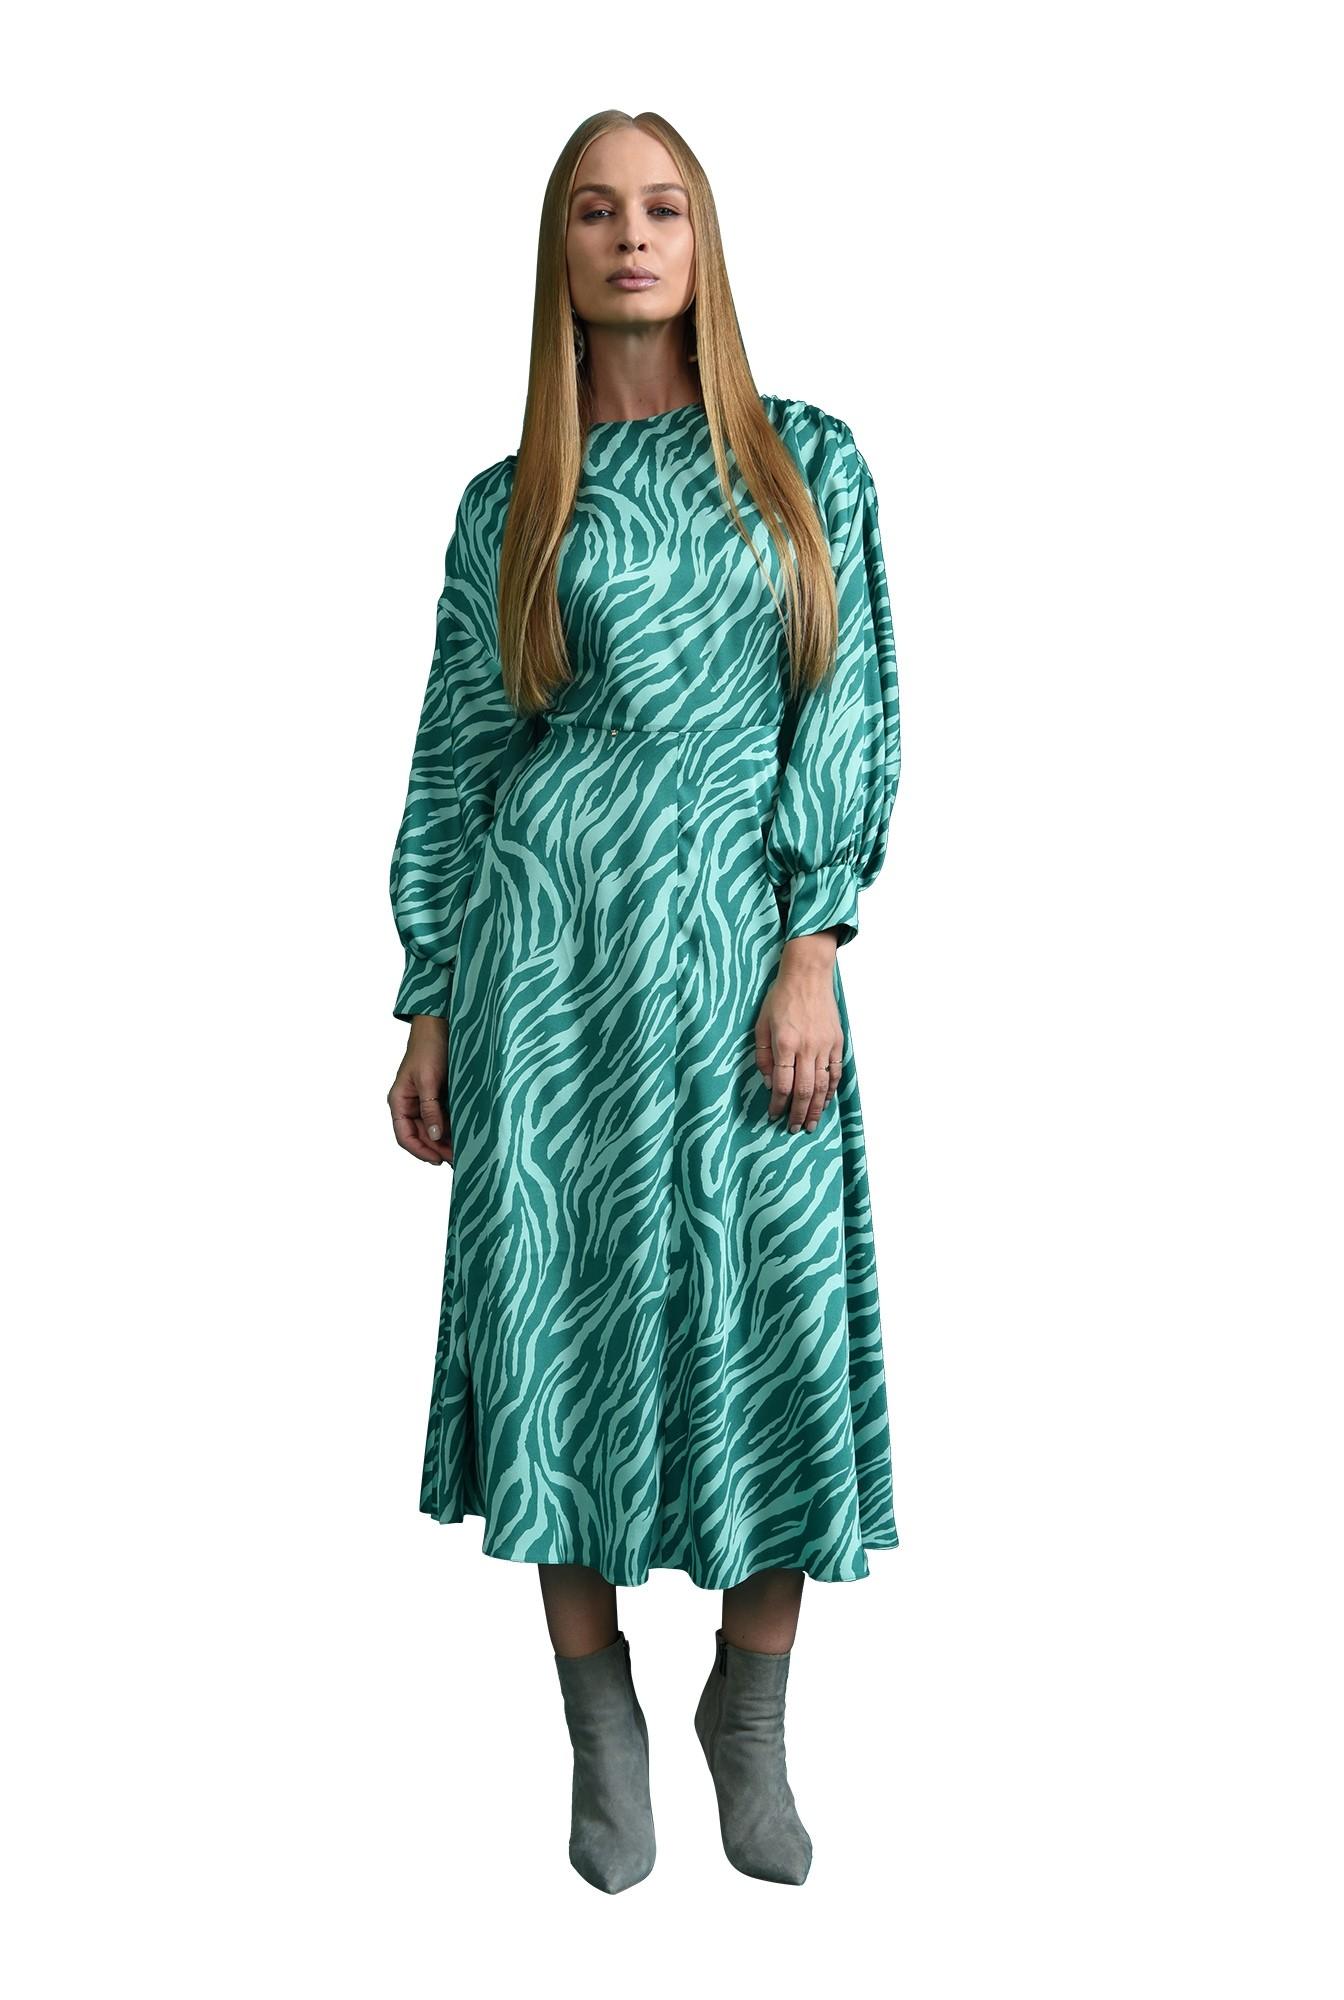 rochie midi, evazata, cu detaliu la umarul cazut